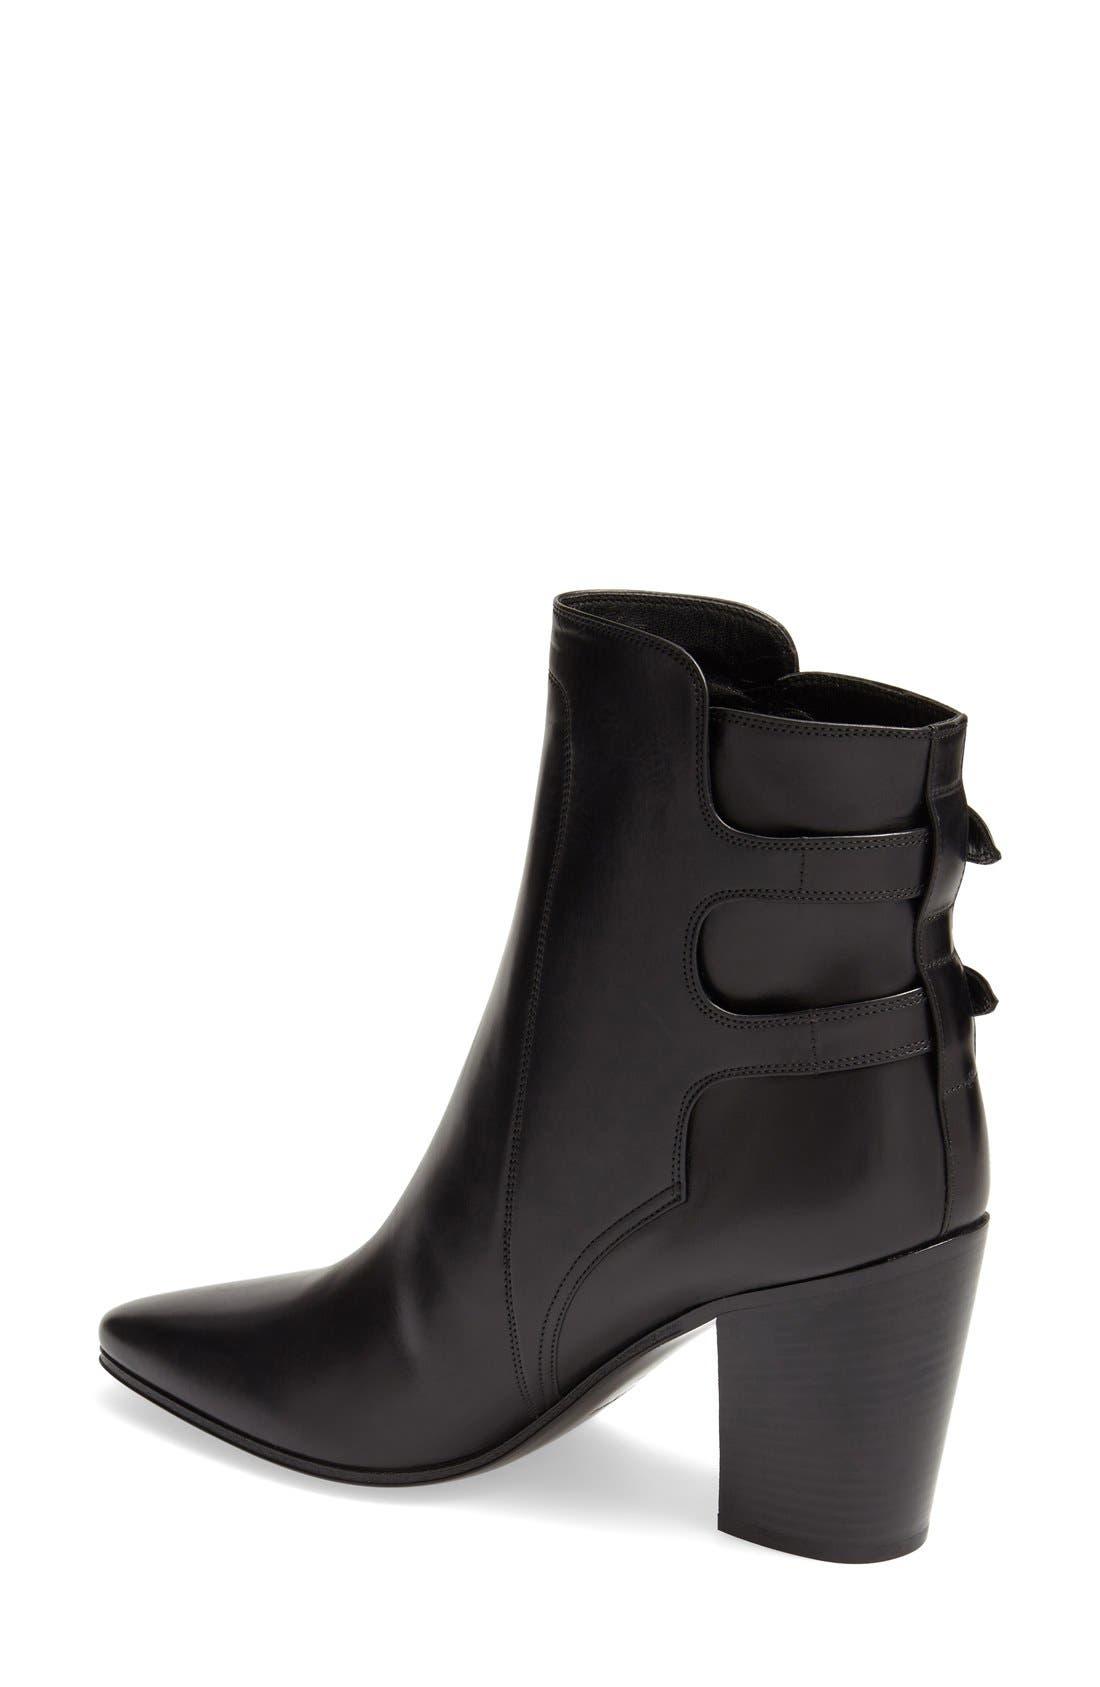 Alternate Image 2  - Saint Laurent Pointy Toe Ankle Boot (Women)